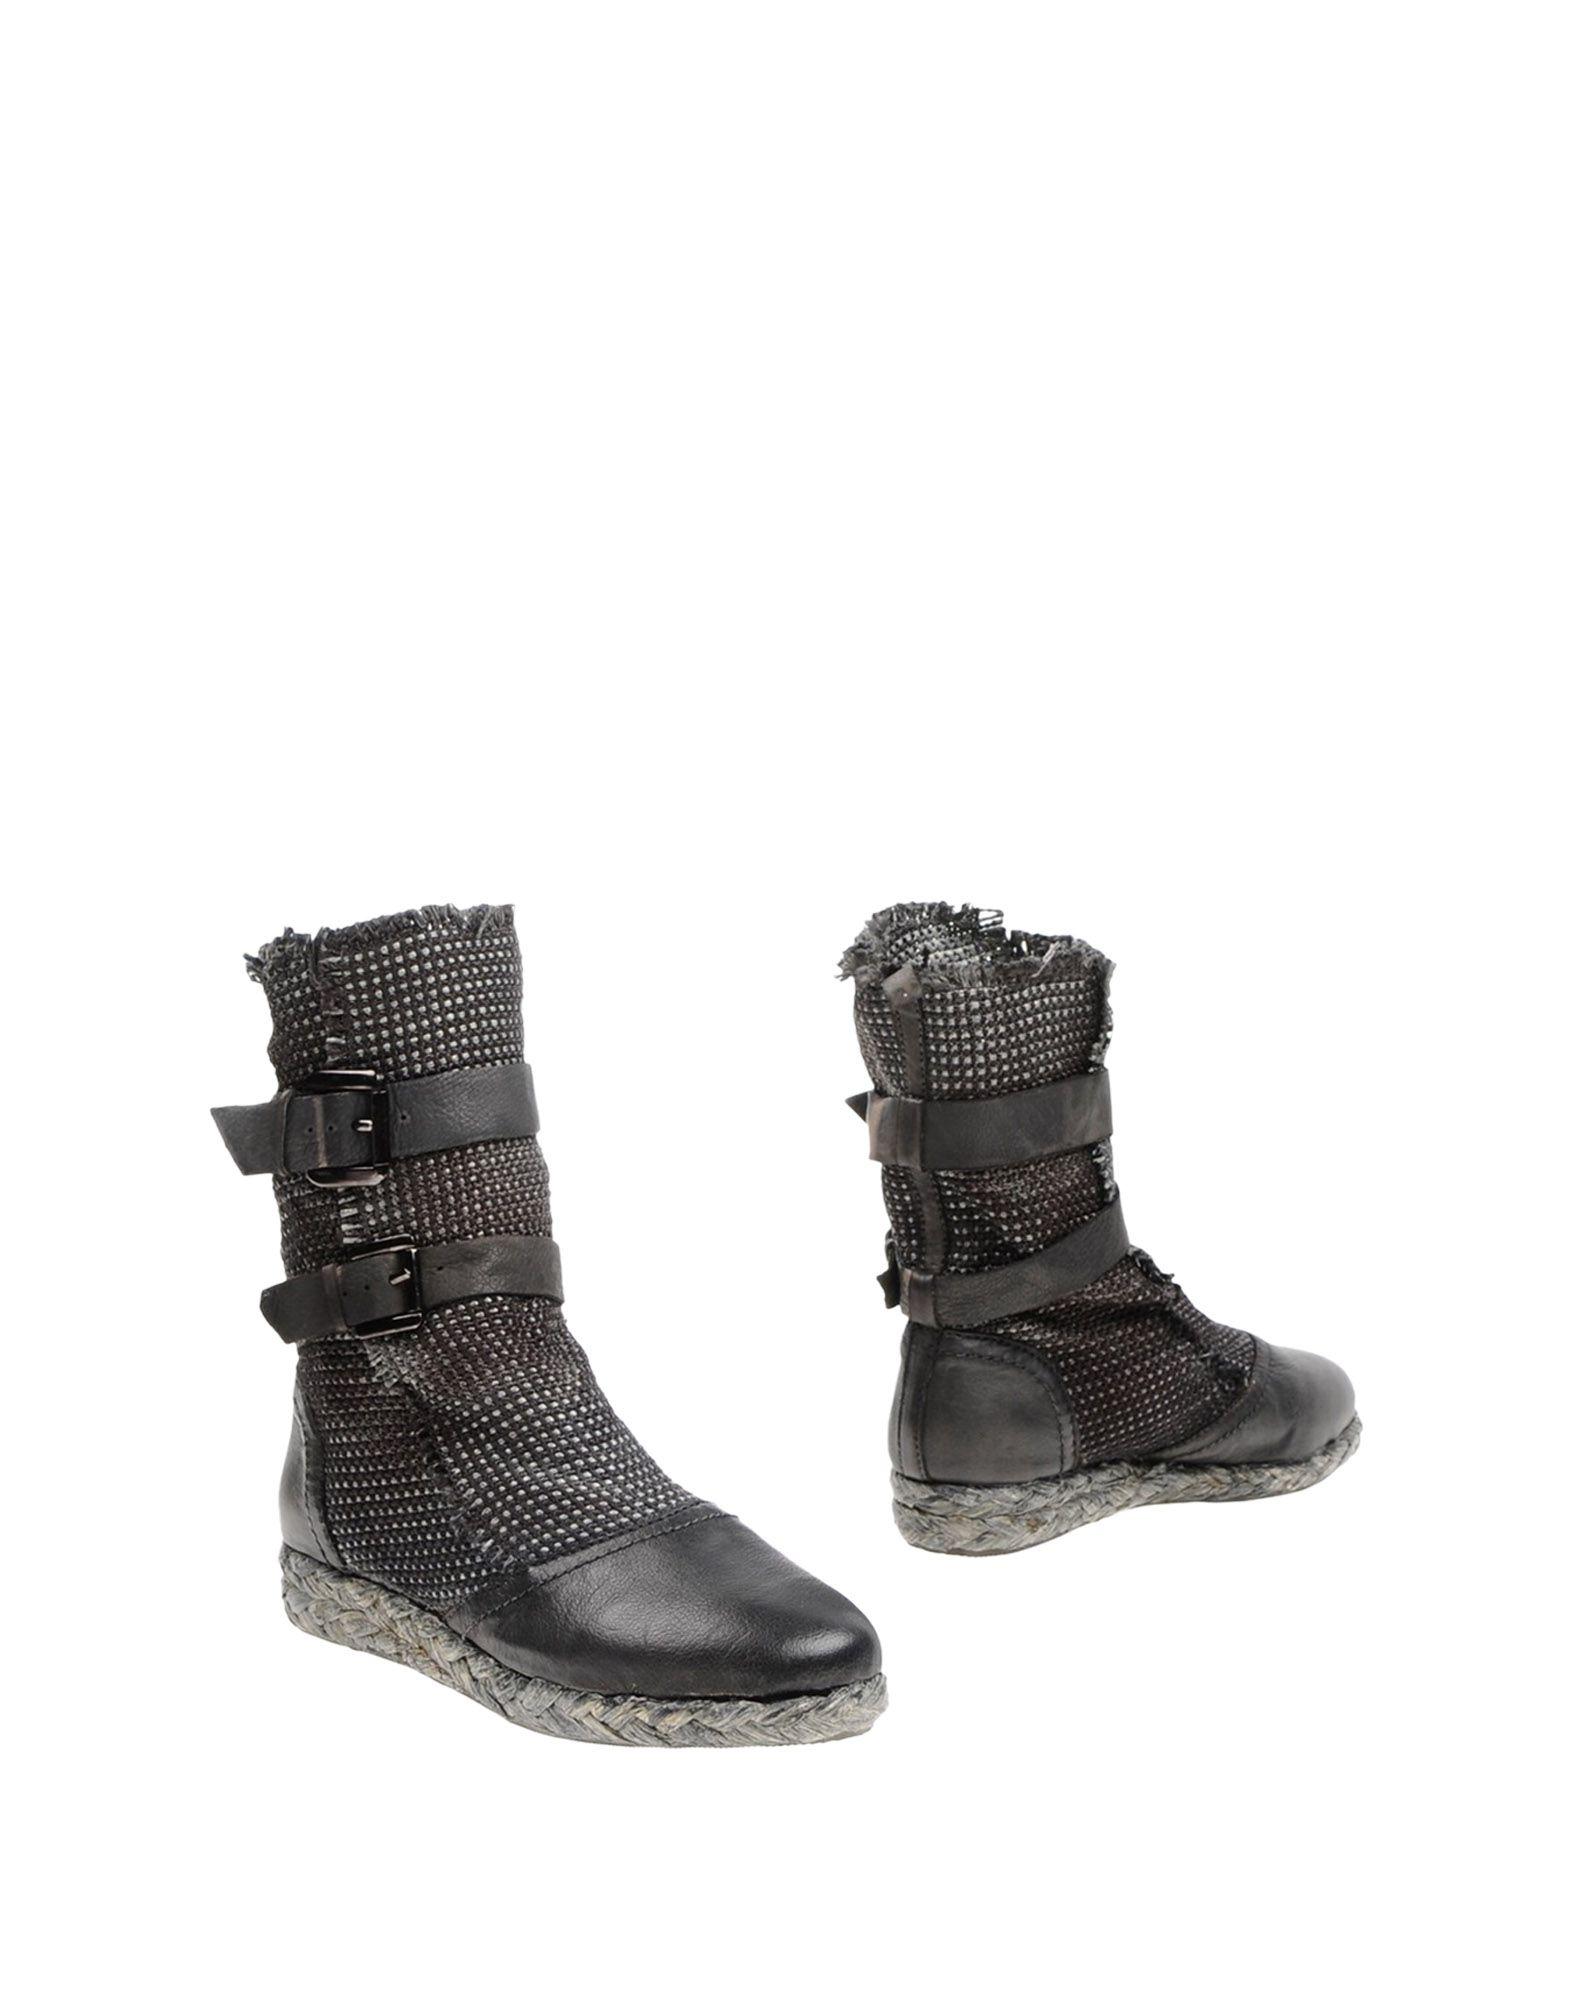 Baldinini Trend Stiefelette Damen  11406826OU Gute Qualität beliebte Schuhe